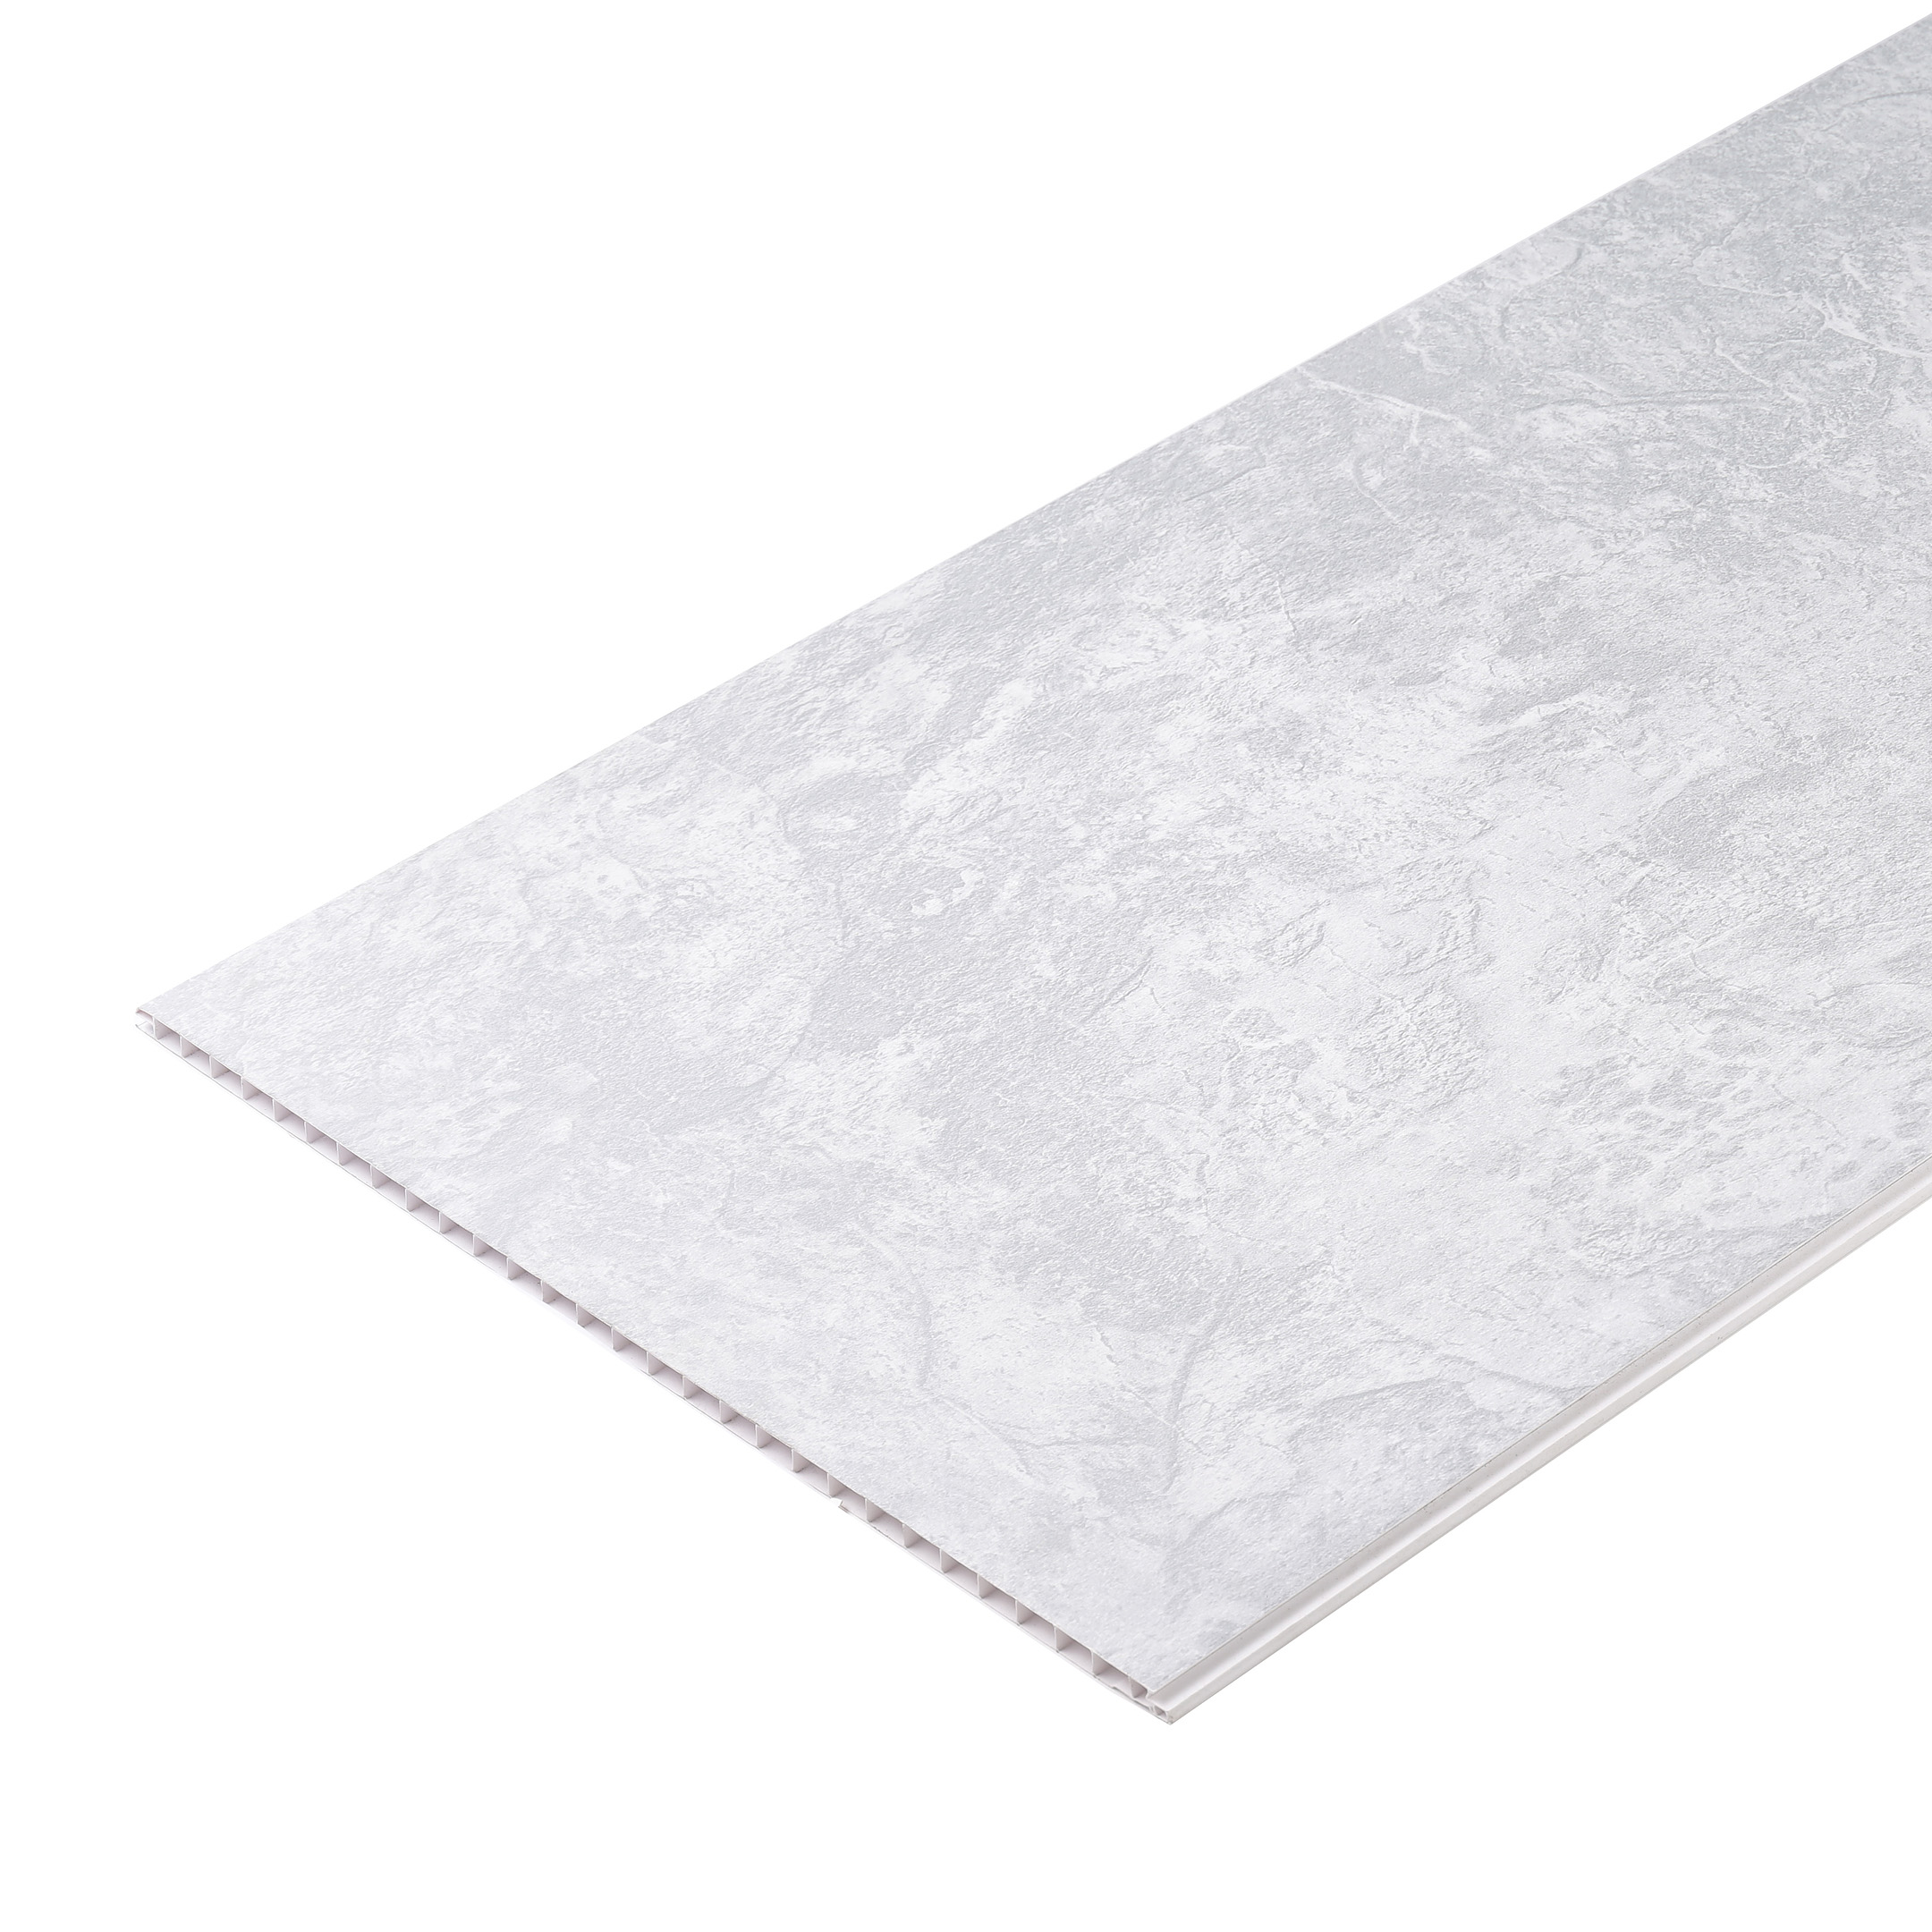 Панель ПВХ 375х2700х8 мм Venta камея белое серебро рельефная